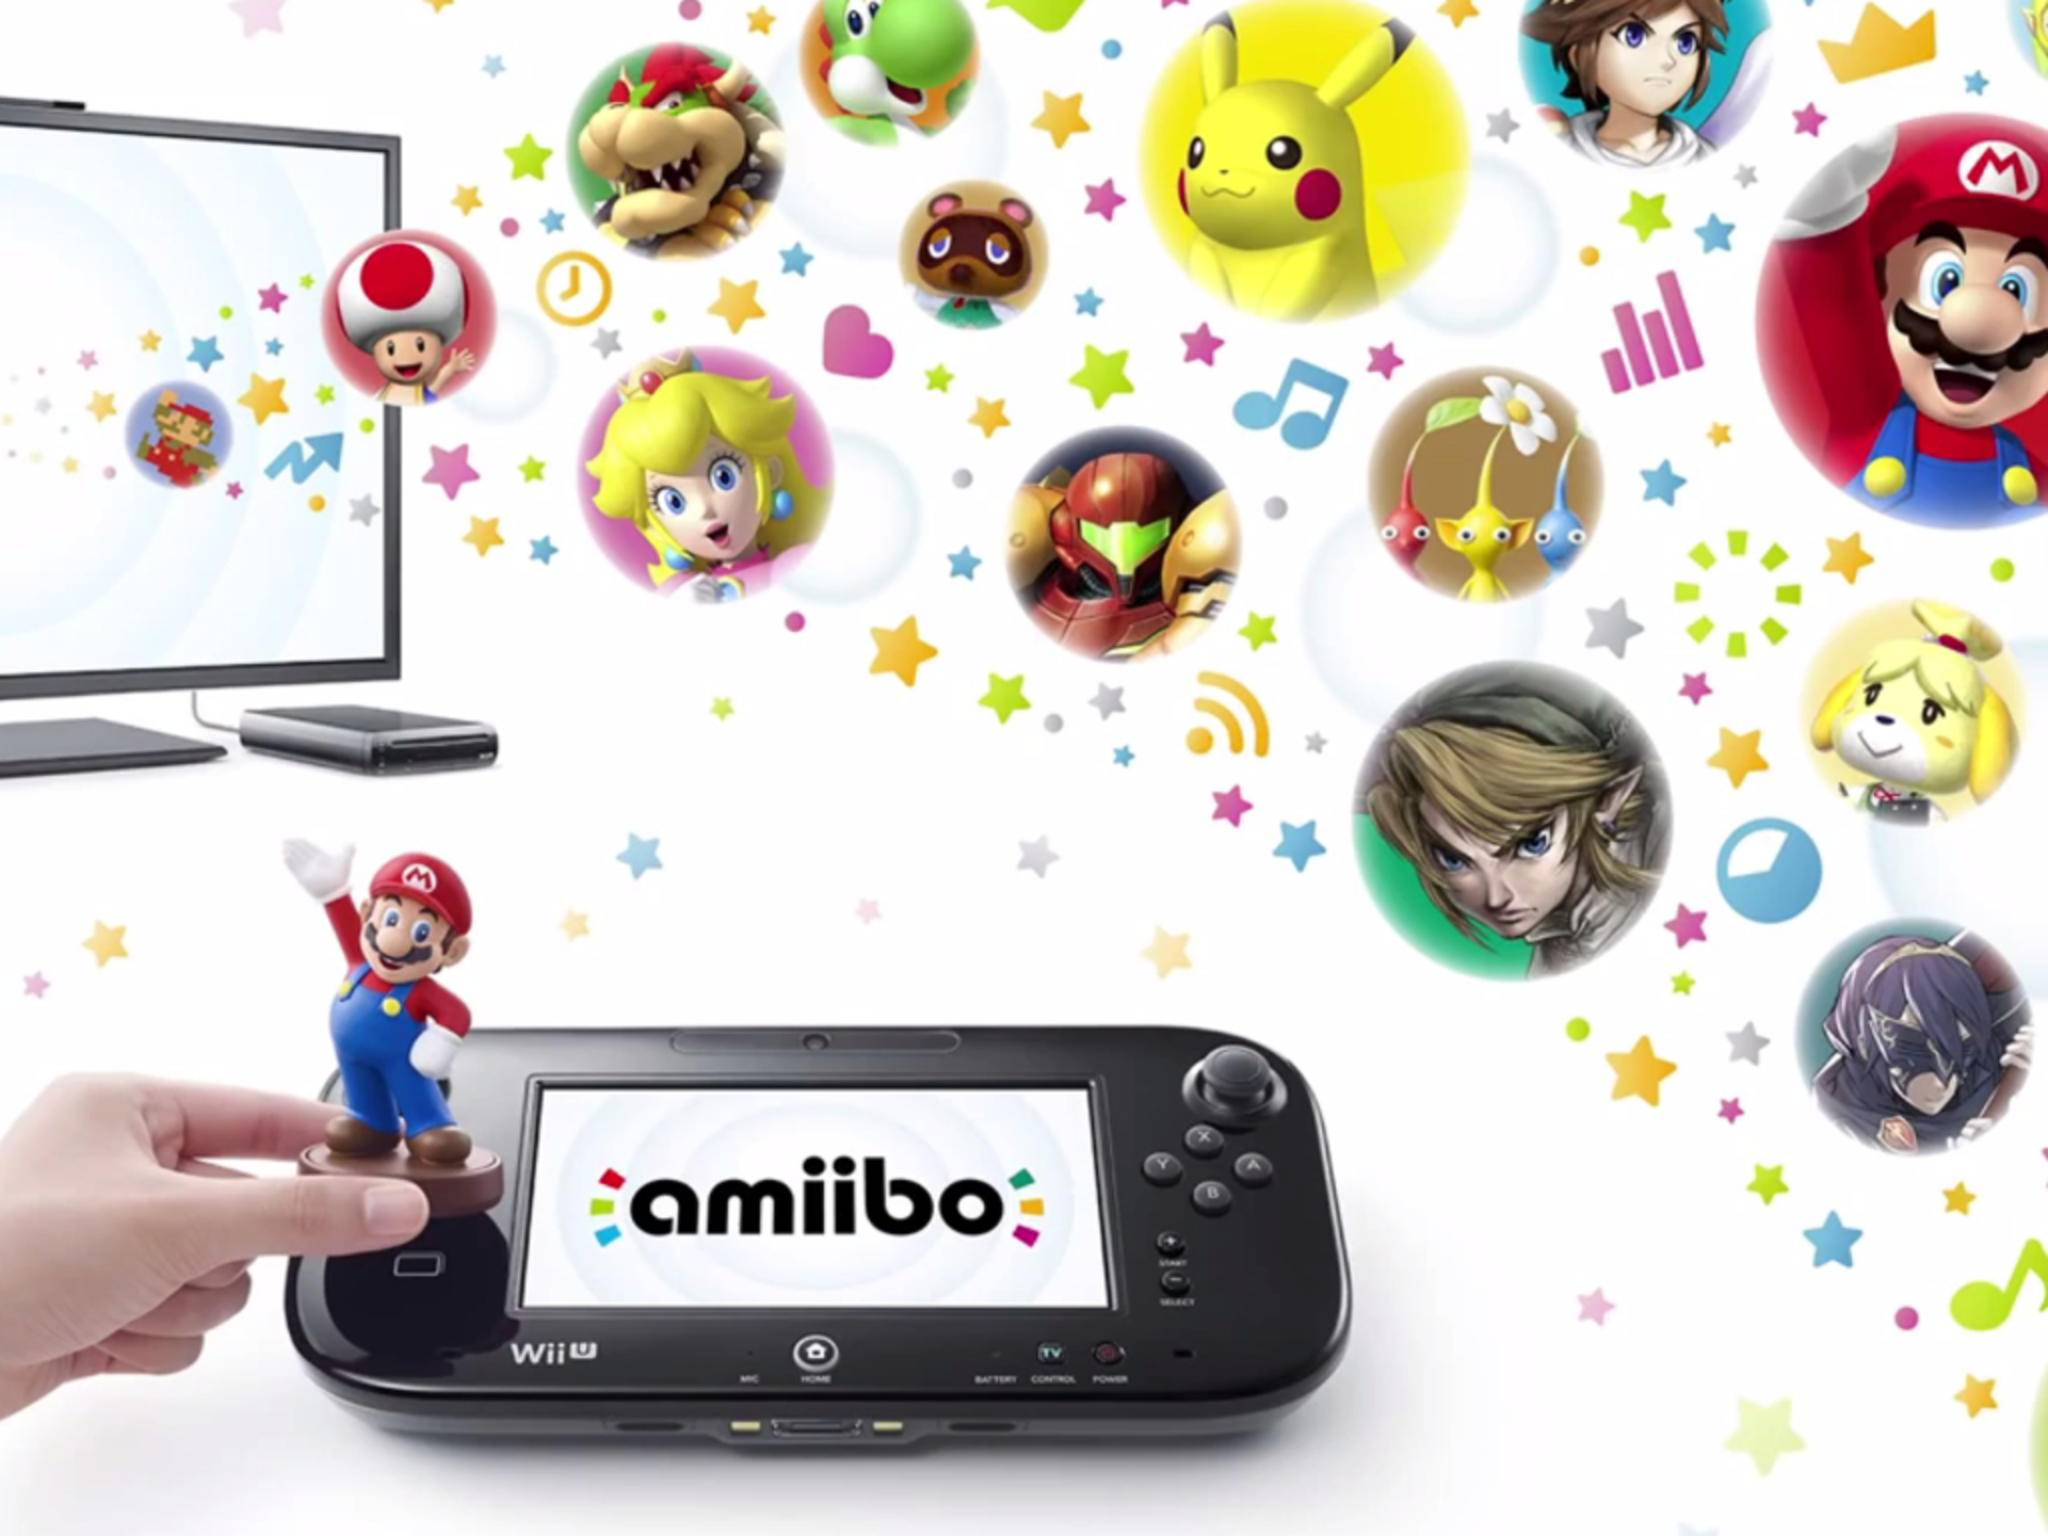 Amiibo Nintendo